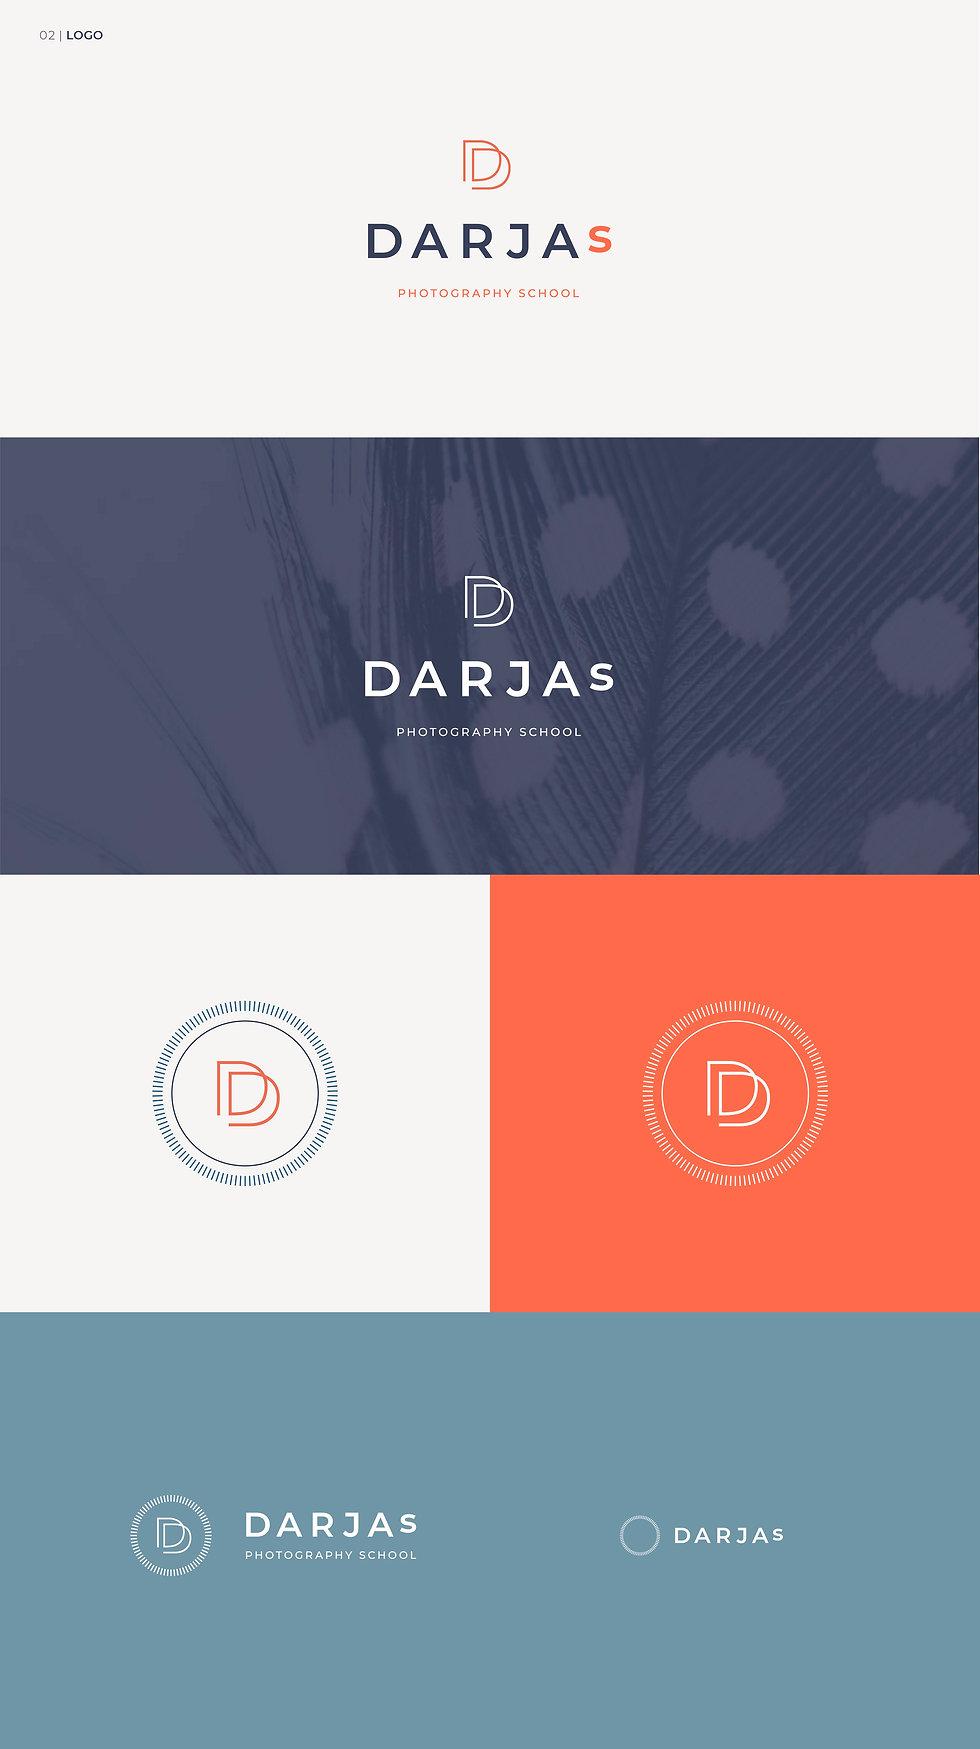 Darja_03.jpg